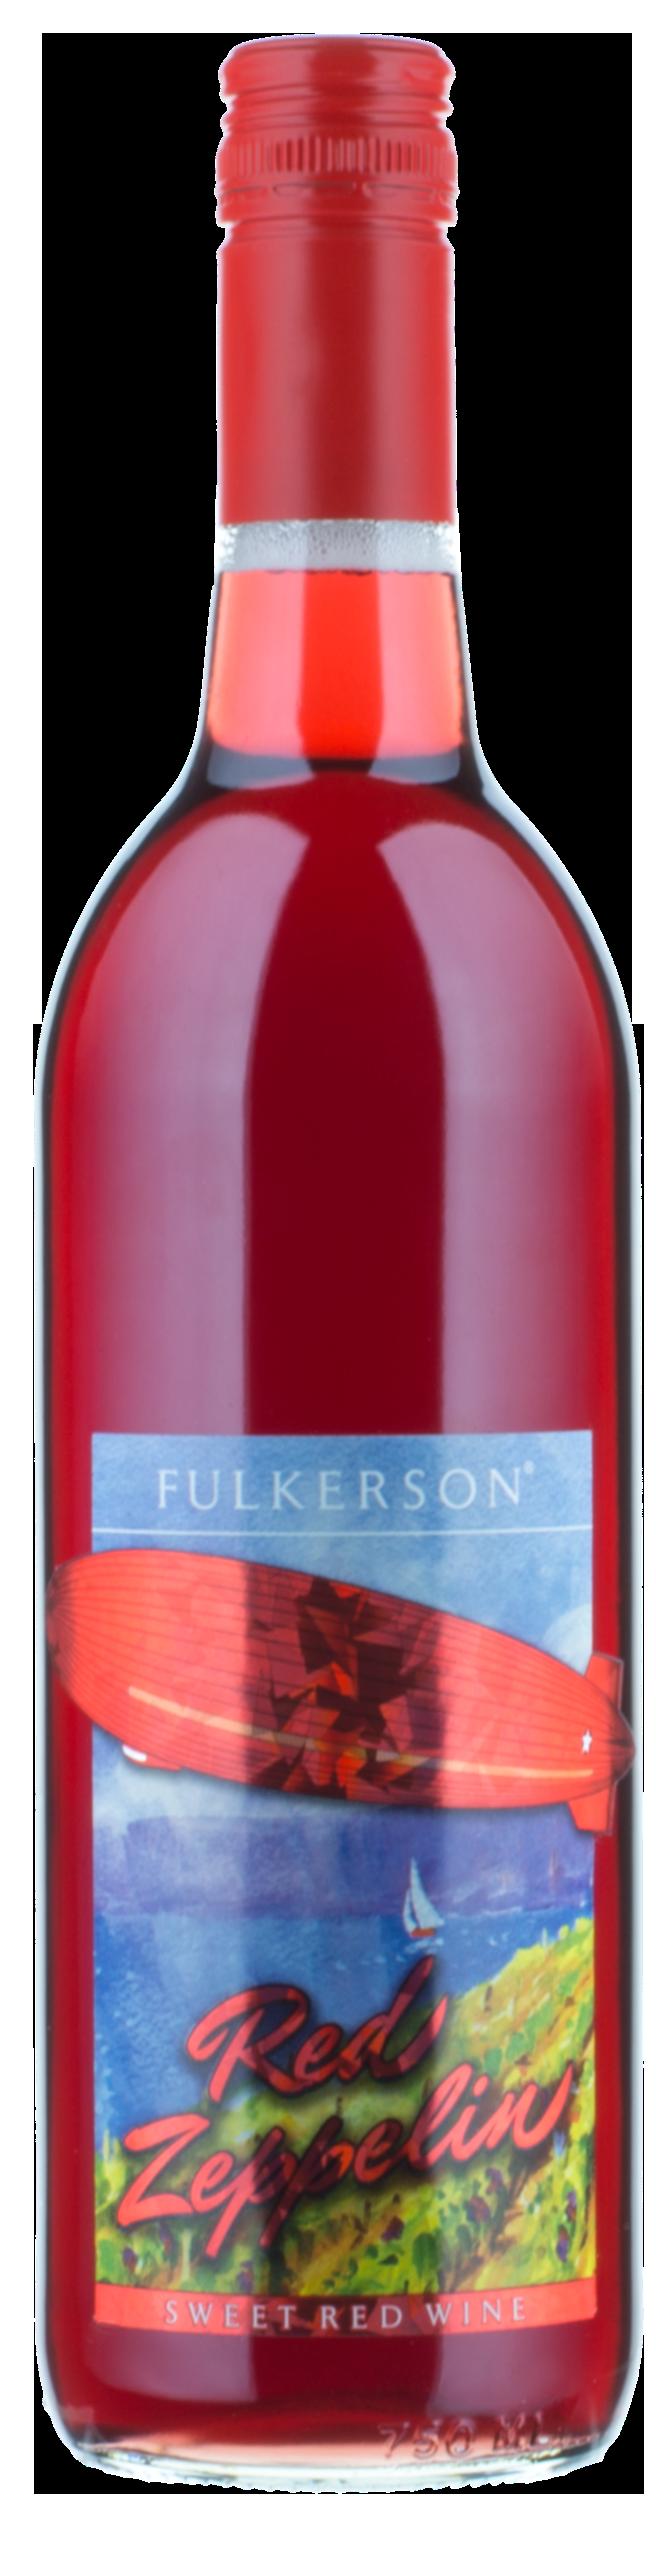 Fulkerson Red Zeppelin 750ml NV